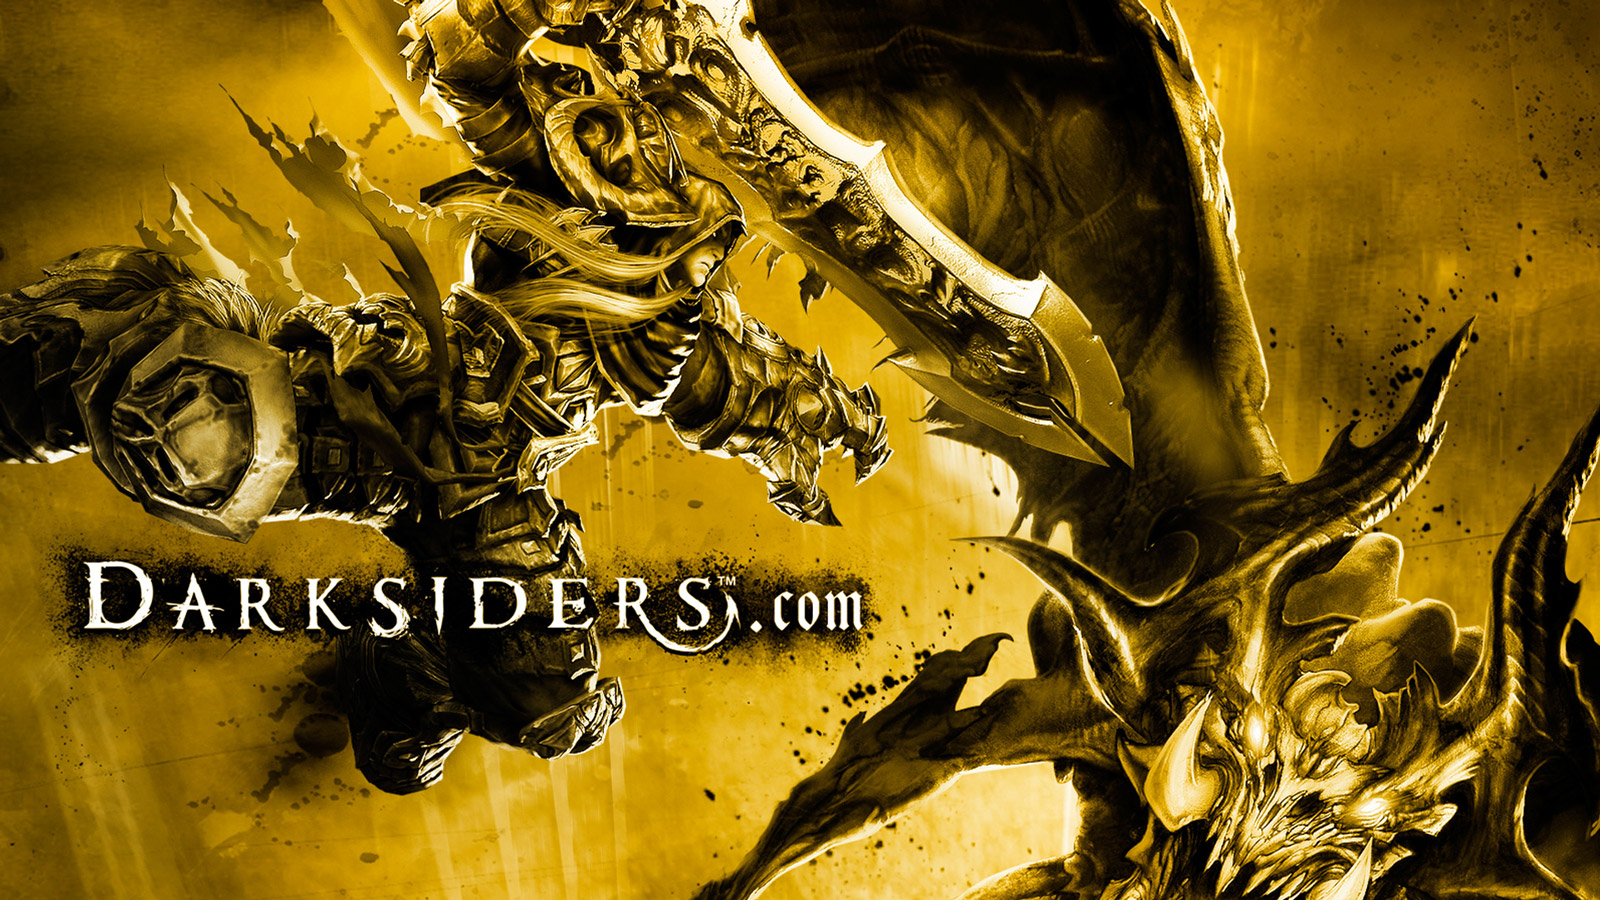 Darksiders Wallpaper in 1600x900